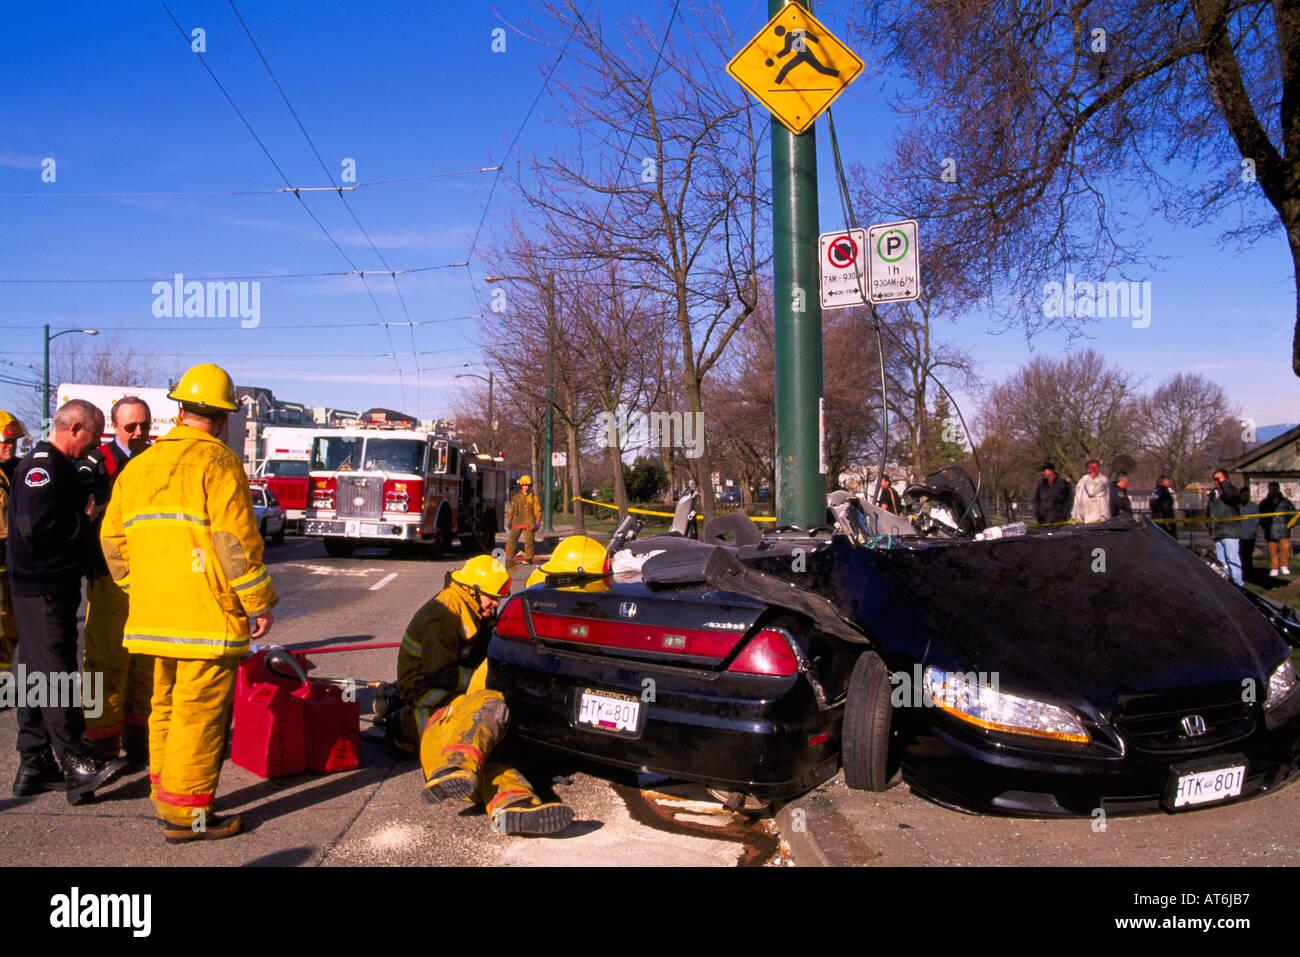 Police investigate Fatal Car Crash Traffic Accident Scene of ...